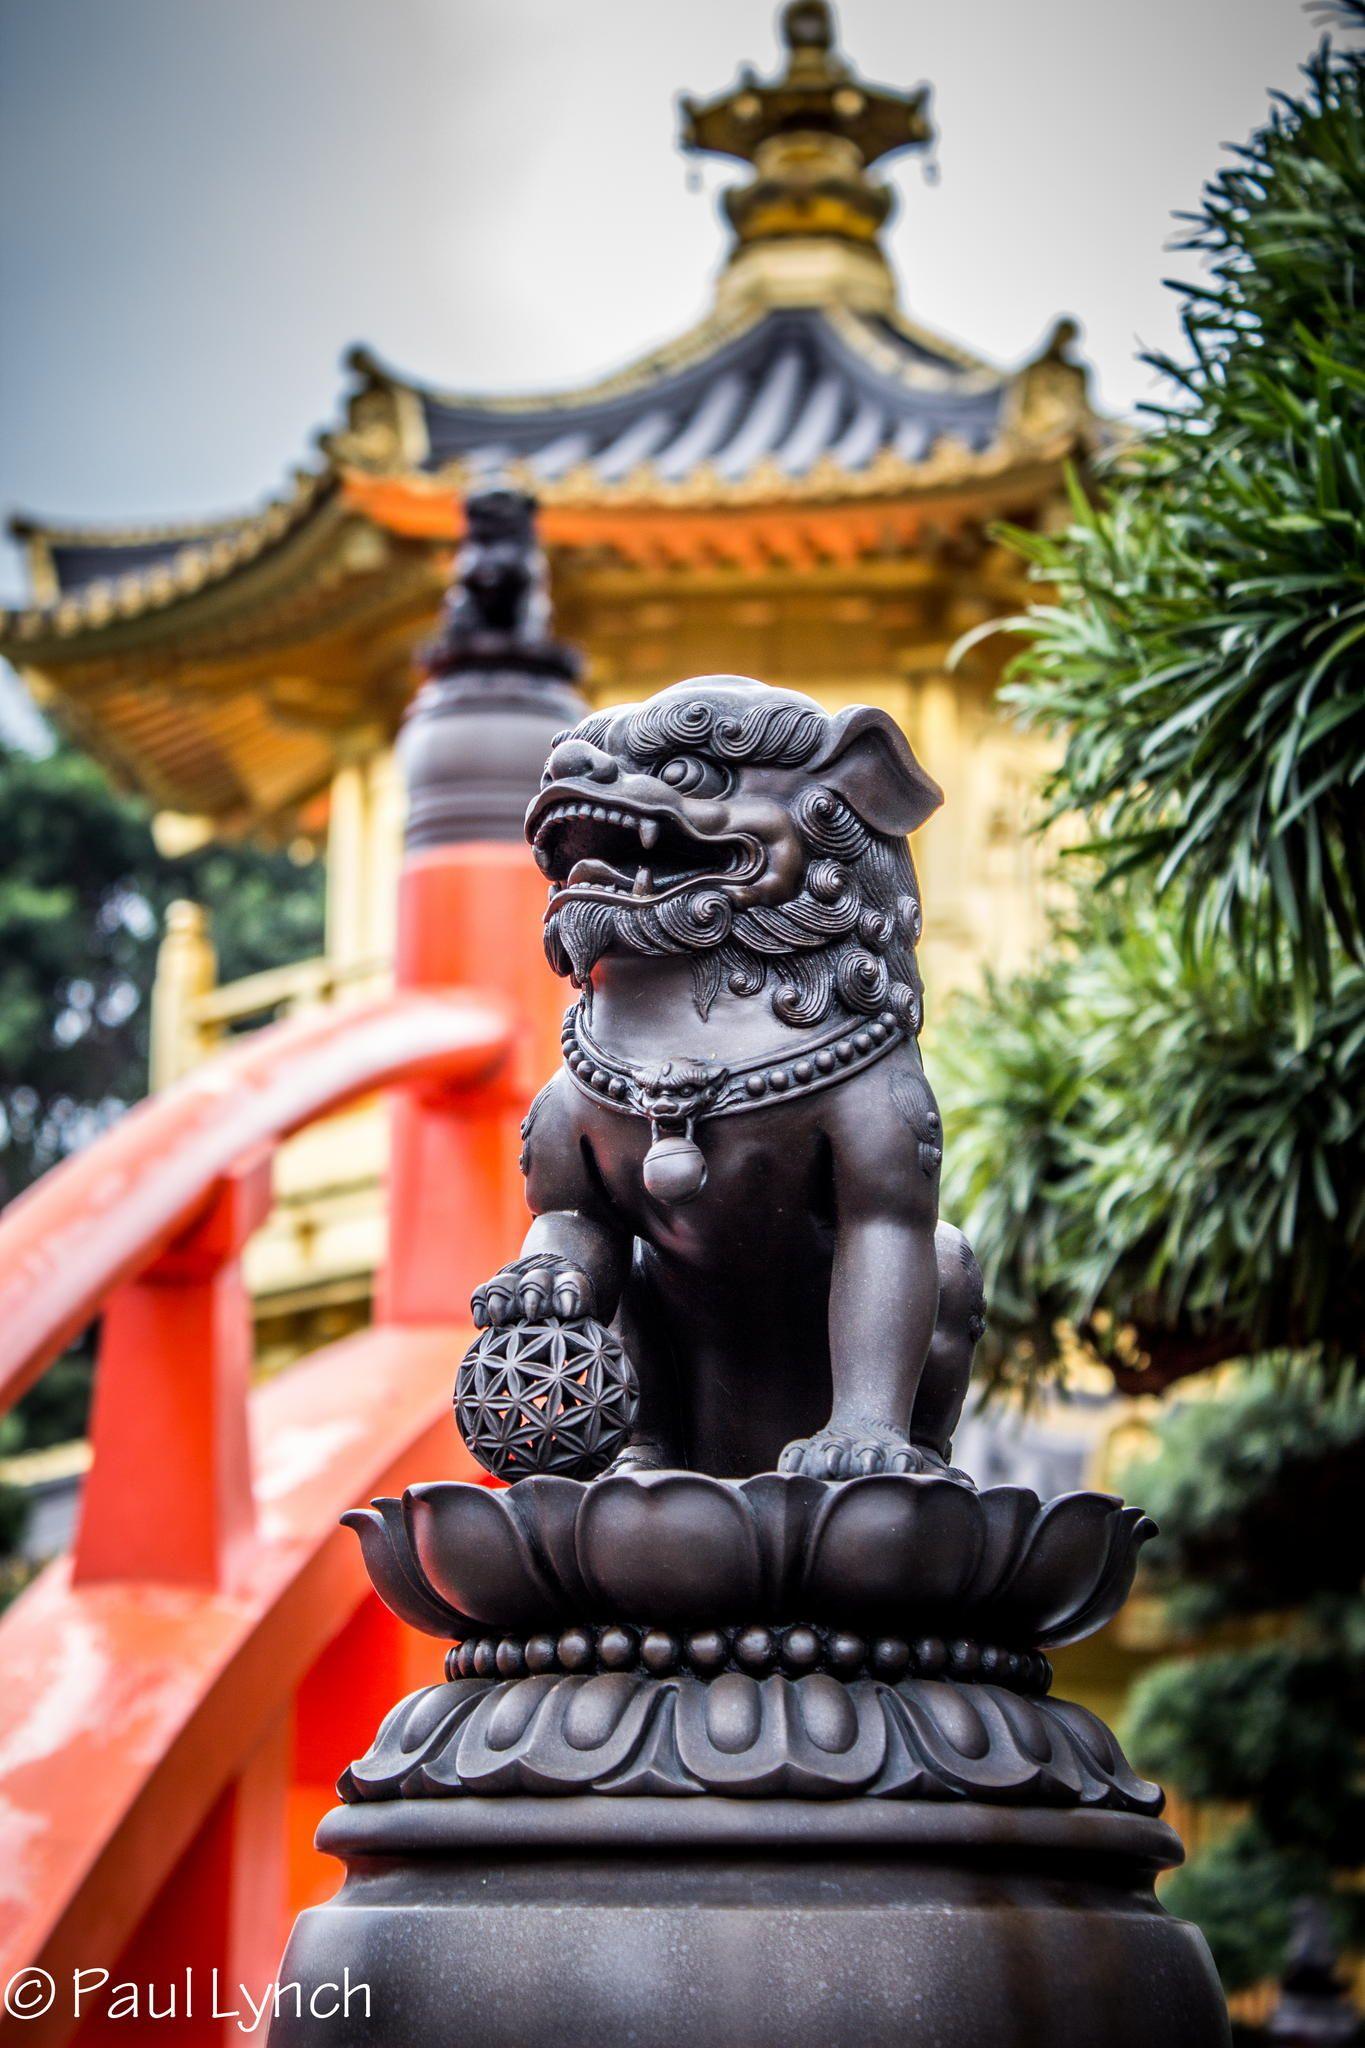 719dd5e321702797da04377b441bfba1 - Lin's Gardens Chinese And Japanese Cuisine